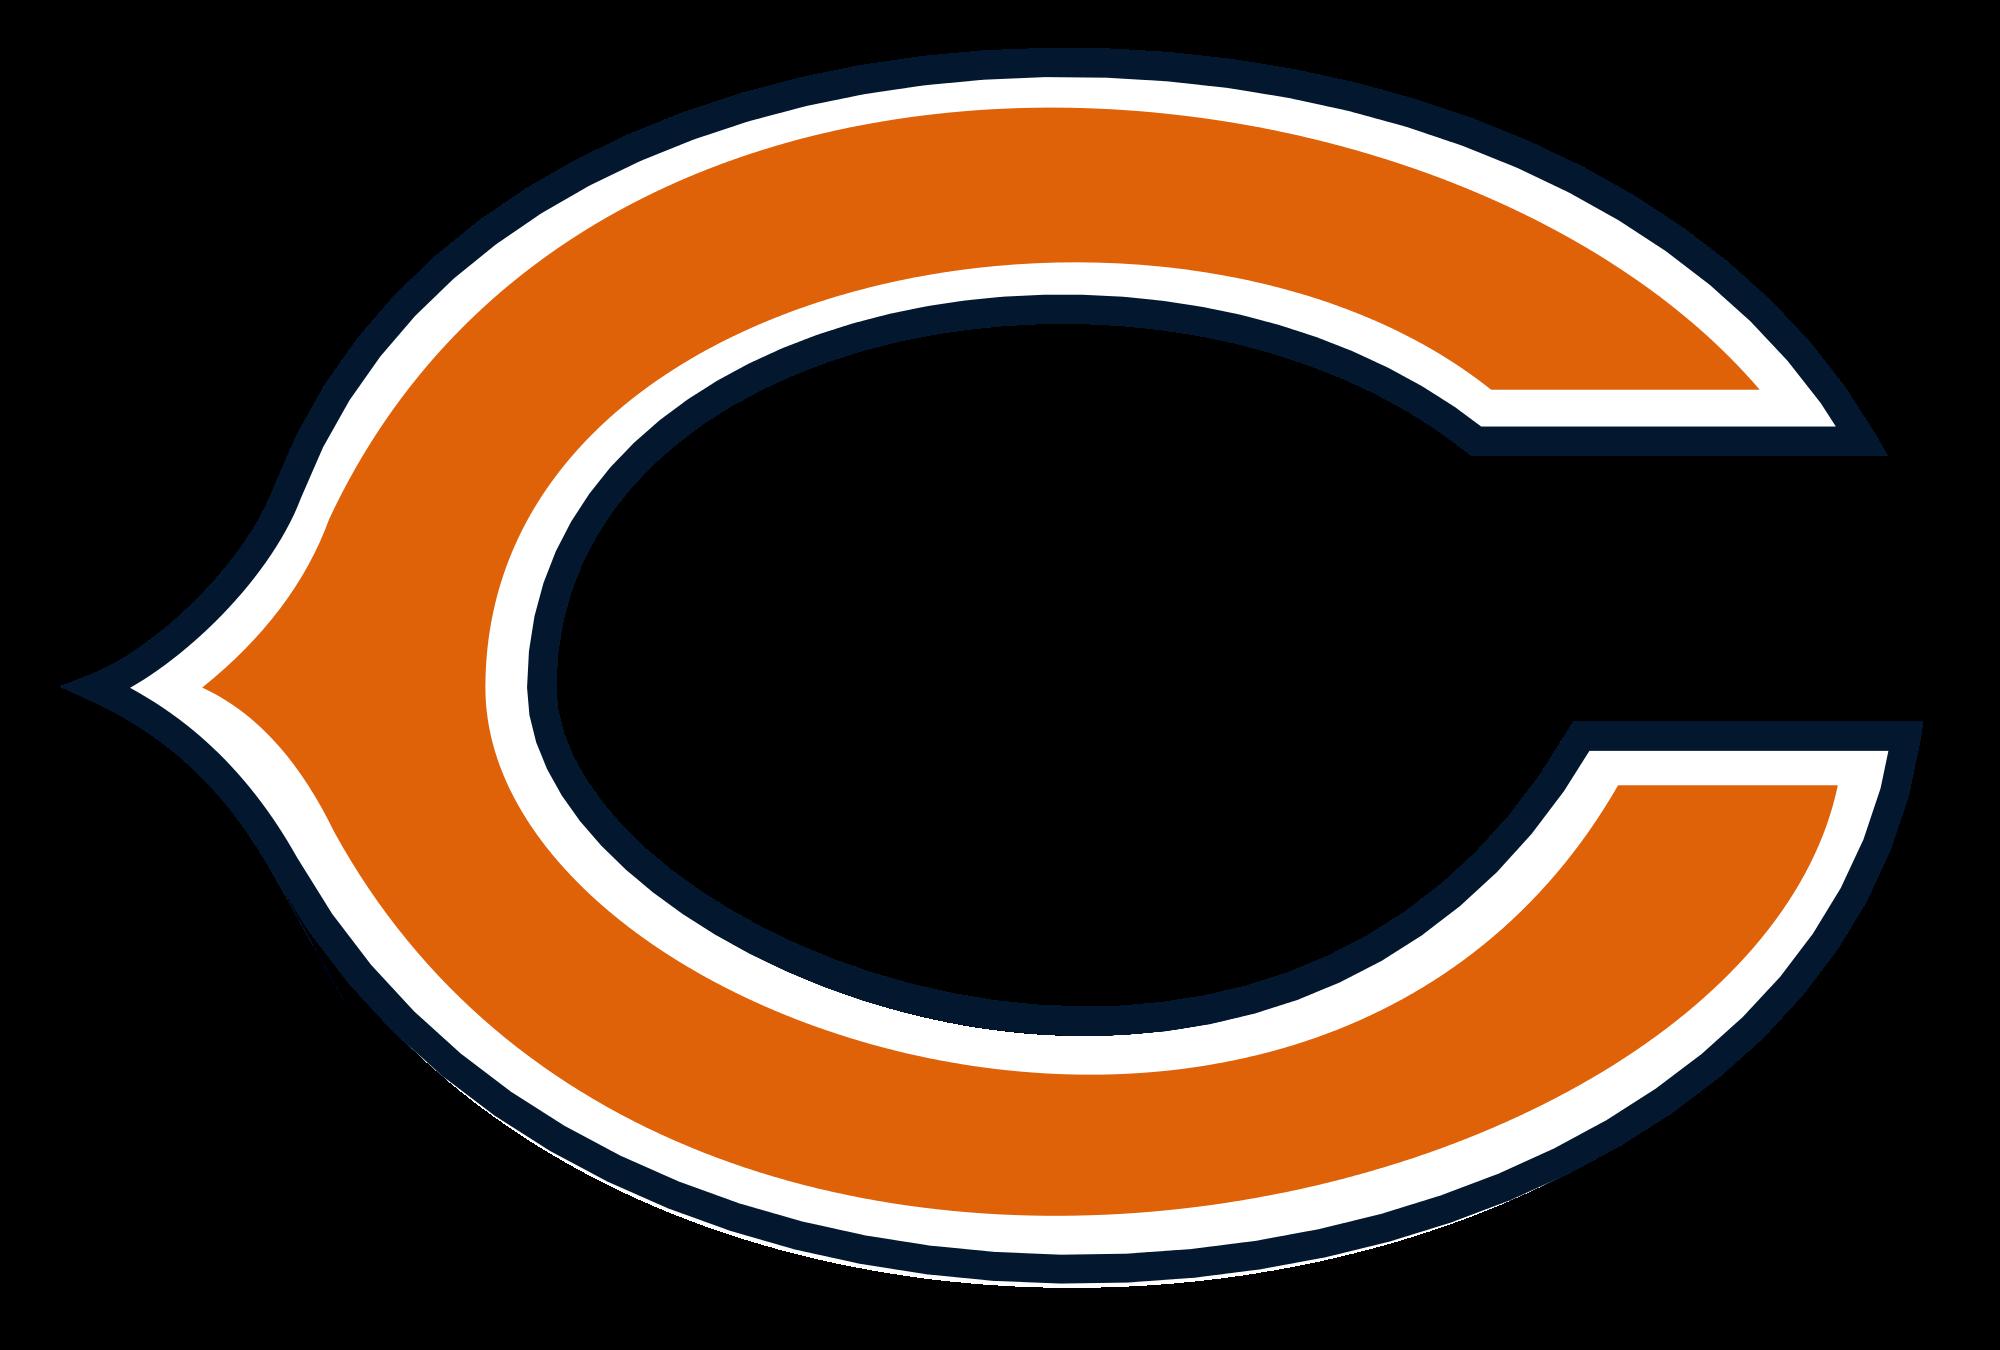 Bear logo - photo#16